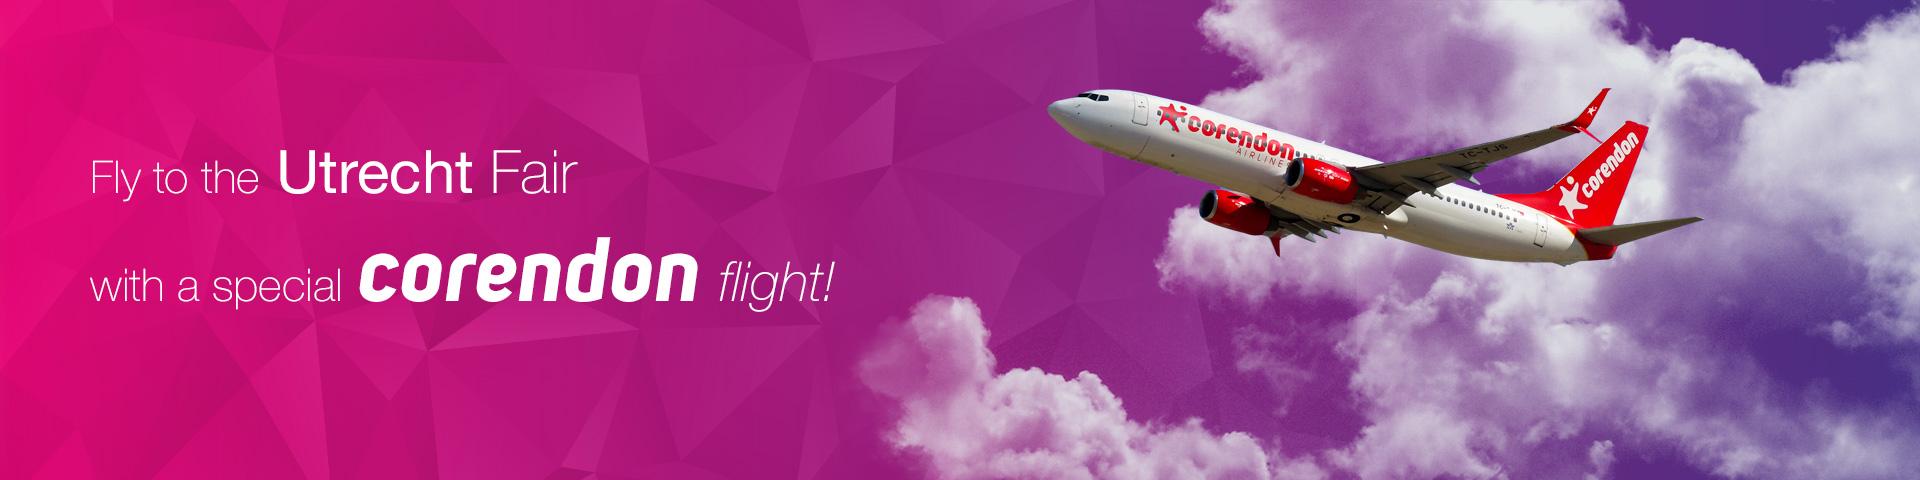 Corendon Airlines Antalya Germany Netherlands Cheap